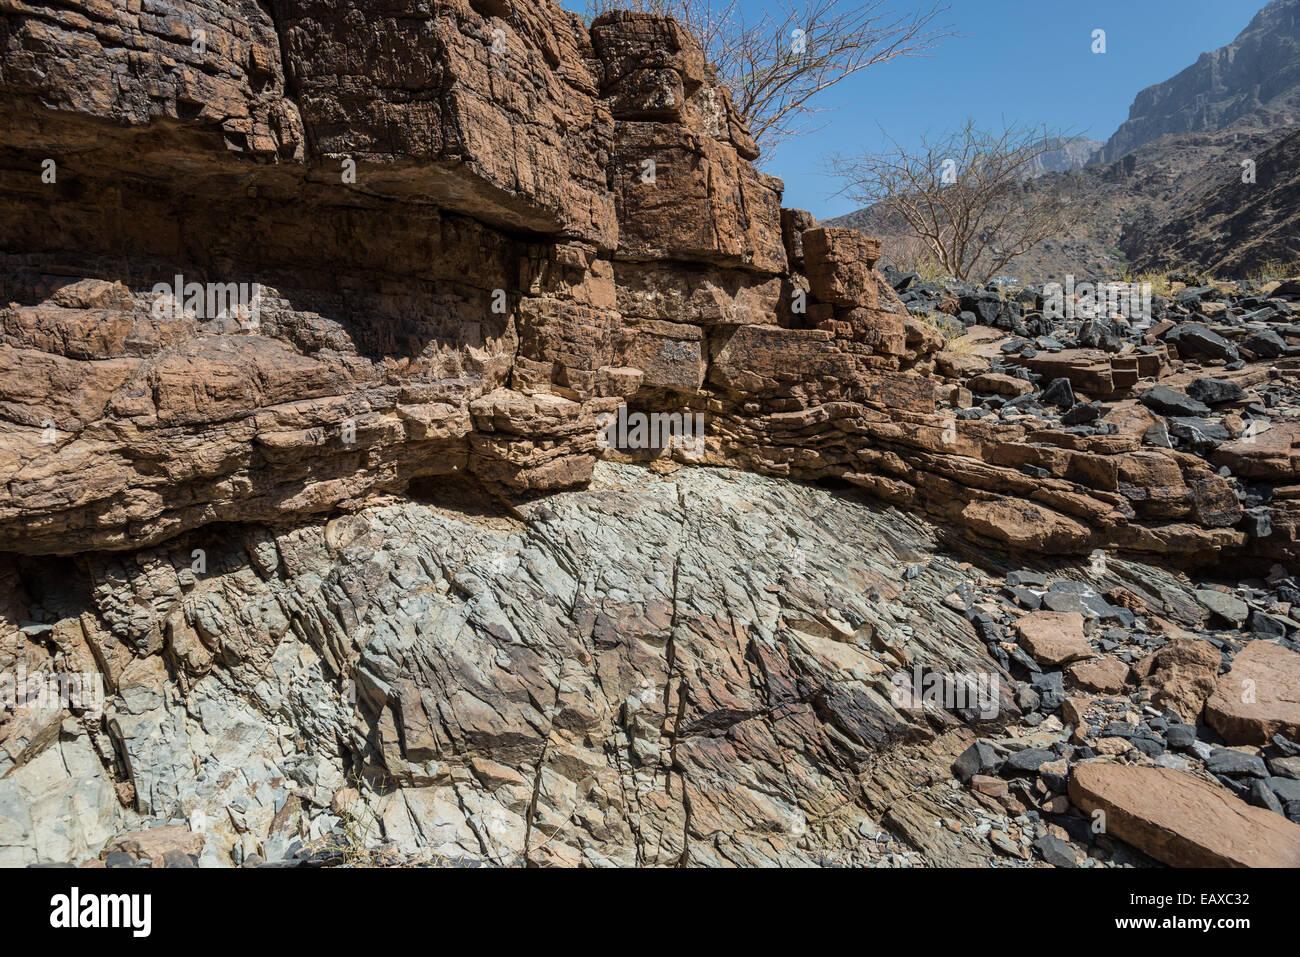 An angular unconformity between gray mudstone and brown dolostone. Oman. - Stock Image